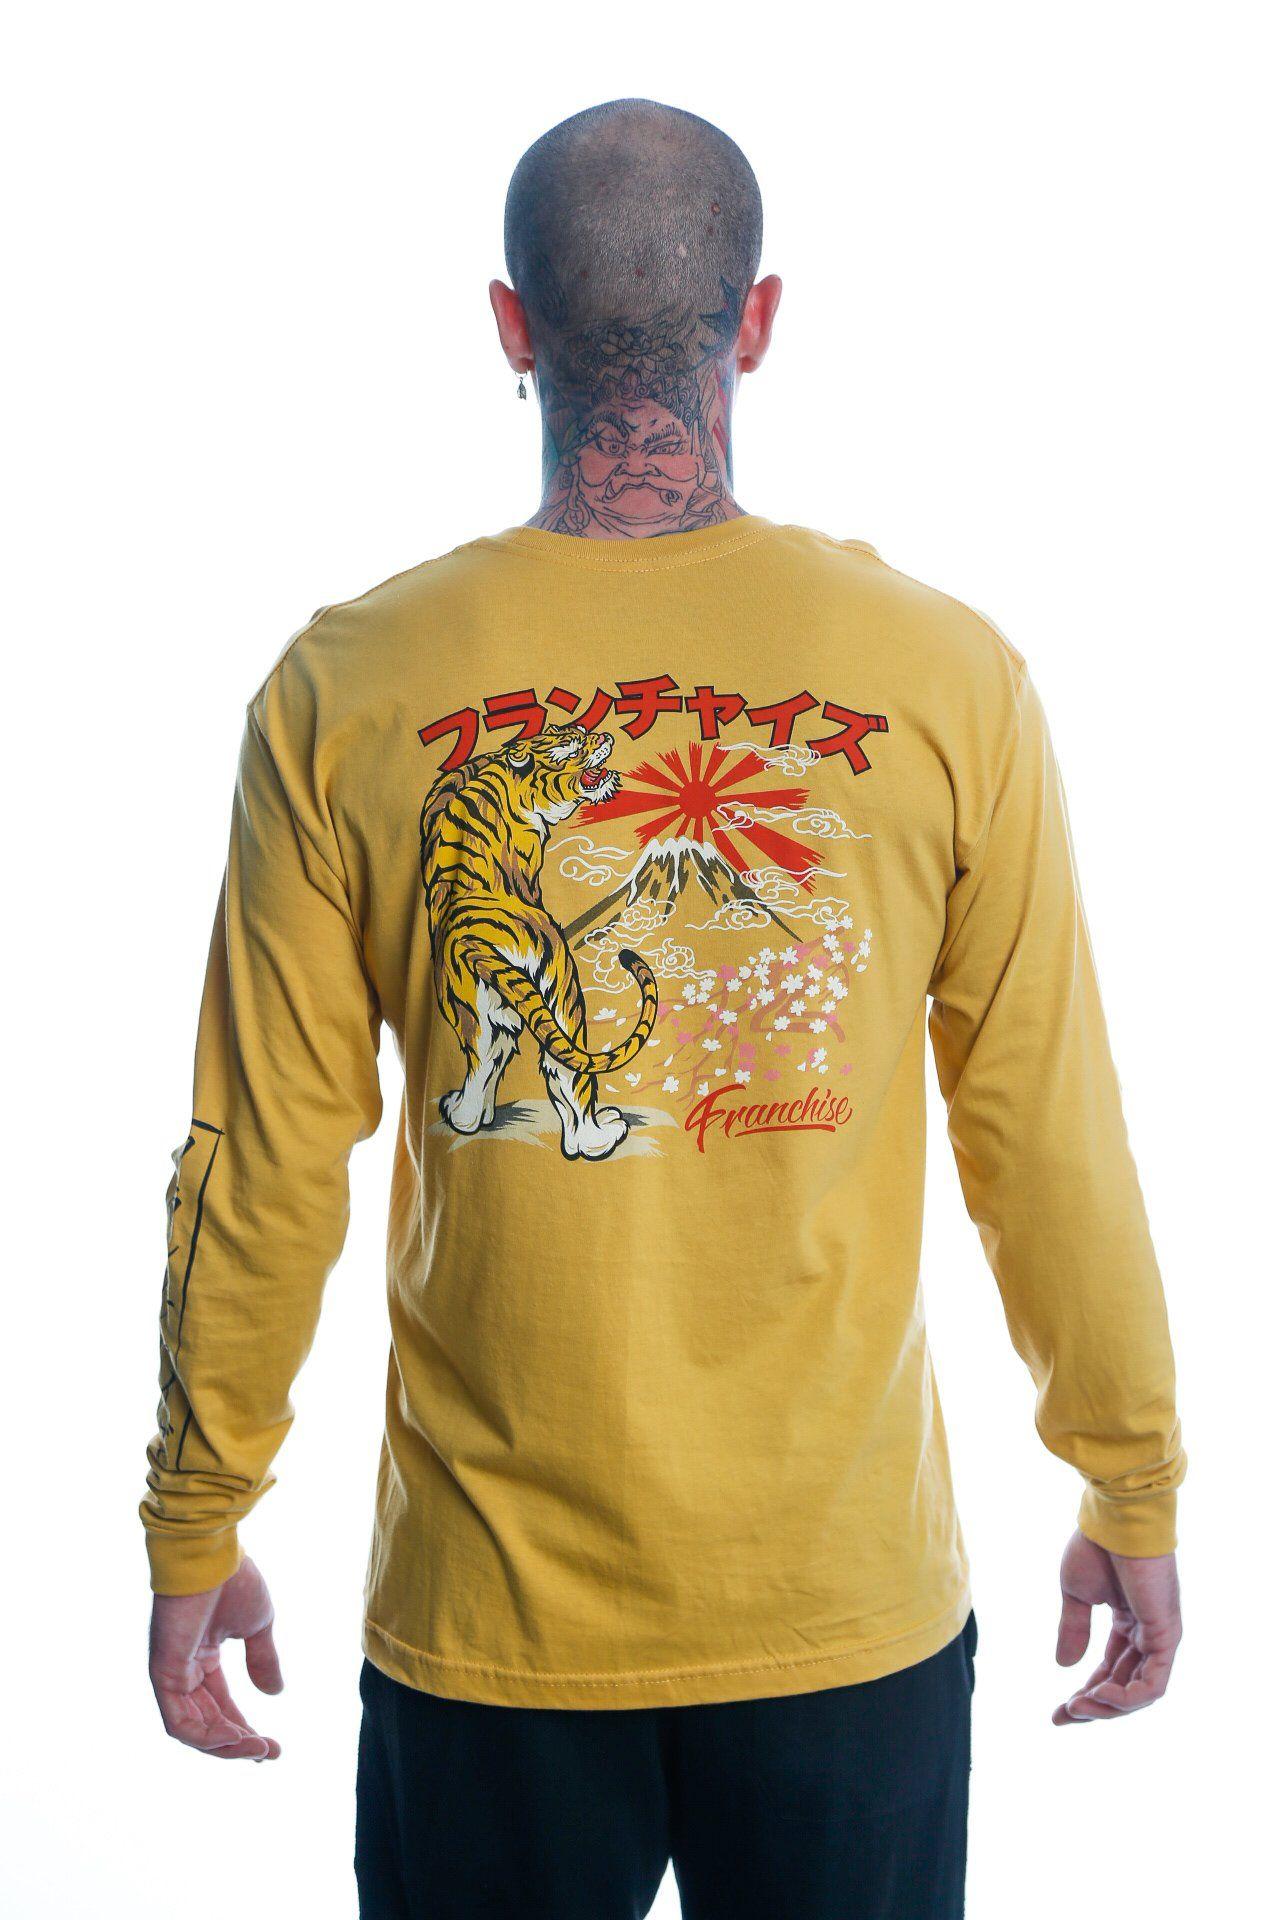 timeless design 06475 f157d Japanese Tiger X Kanji X Franchise Gold Long Sleeve